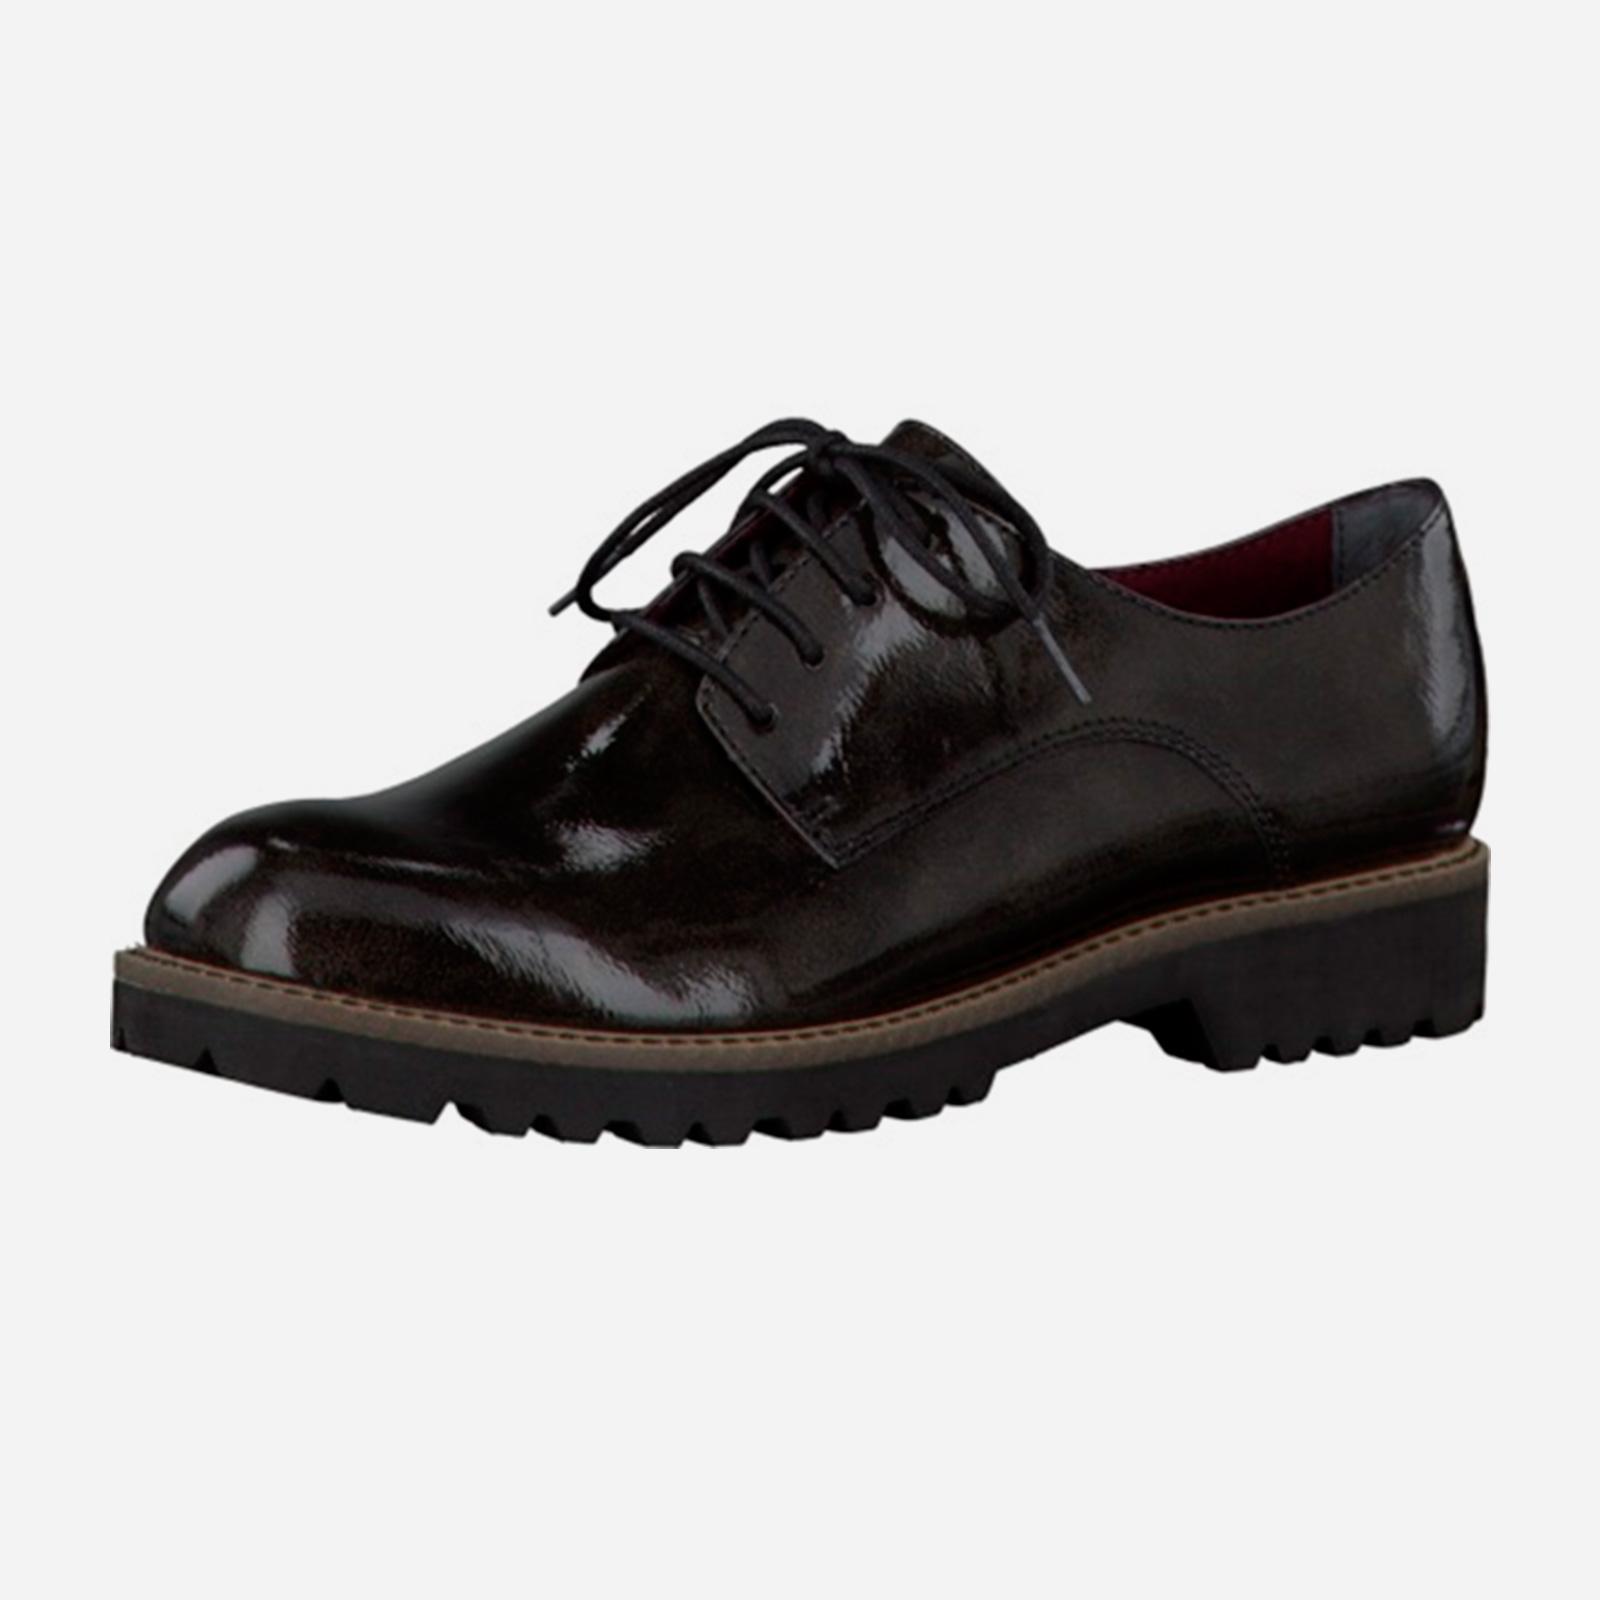 Ботинки женские классические на шнурках